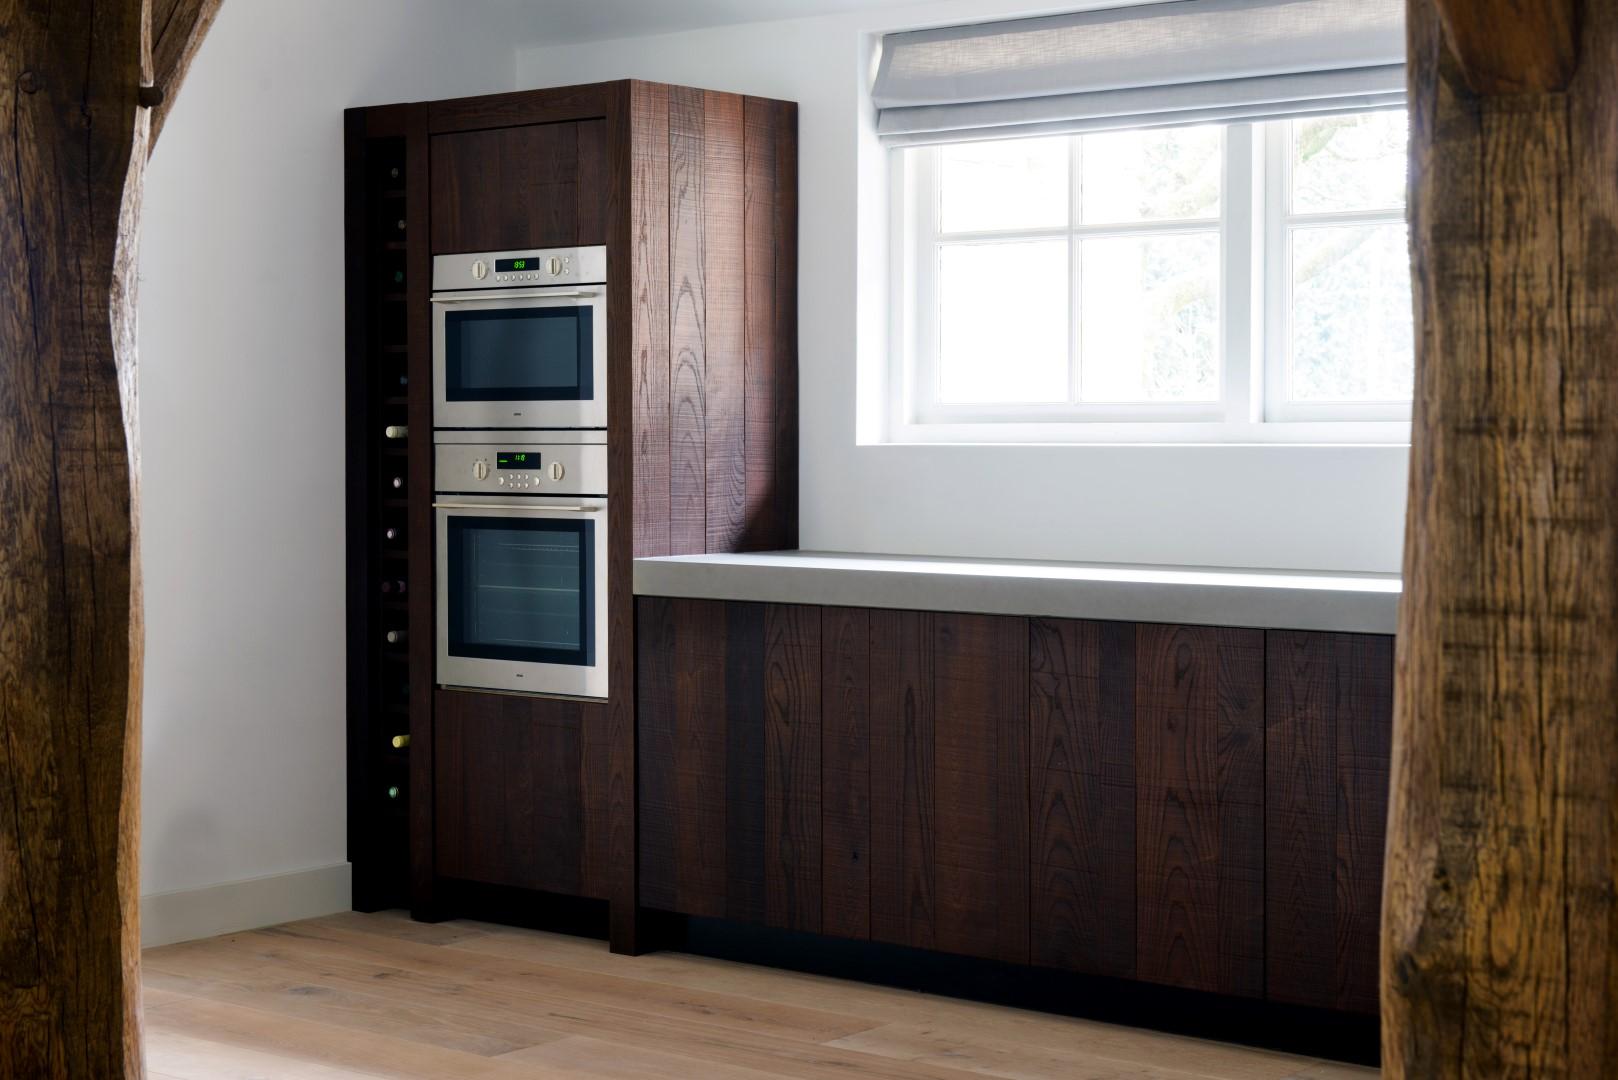 Moderne Keukens Inbouwapparatuur : Moderne houten keukens van JP ...